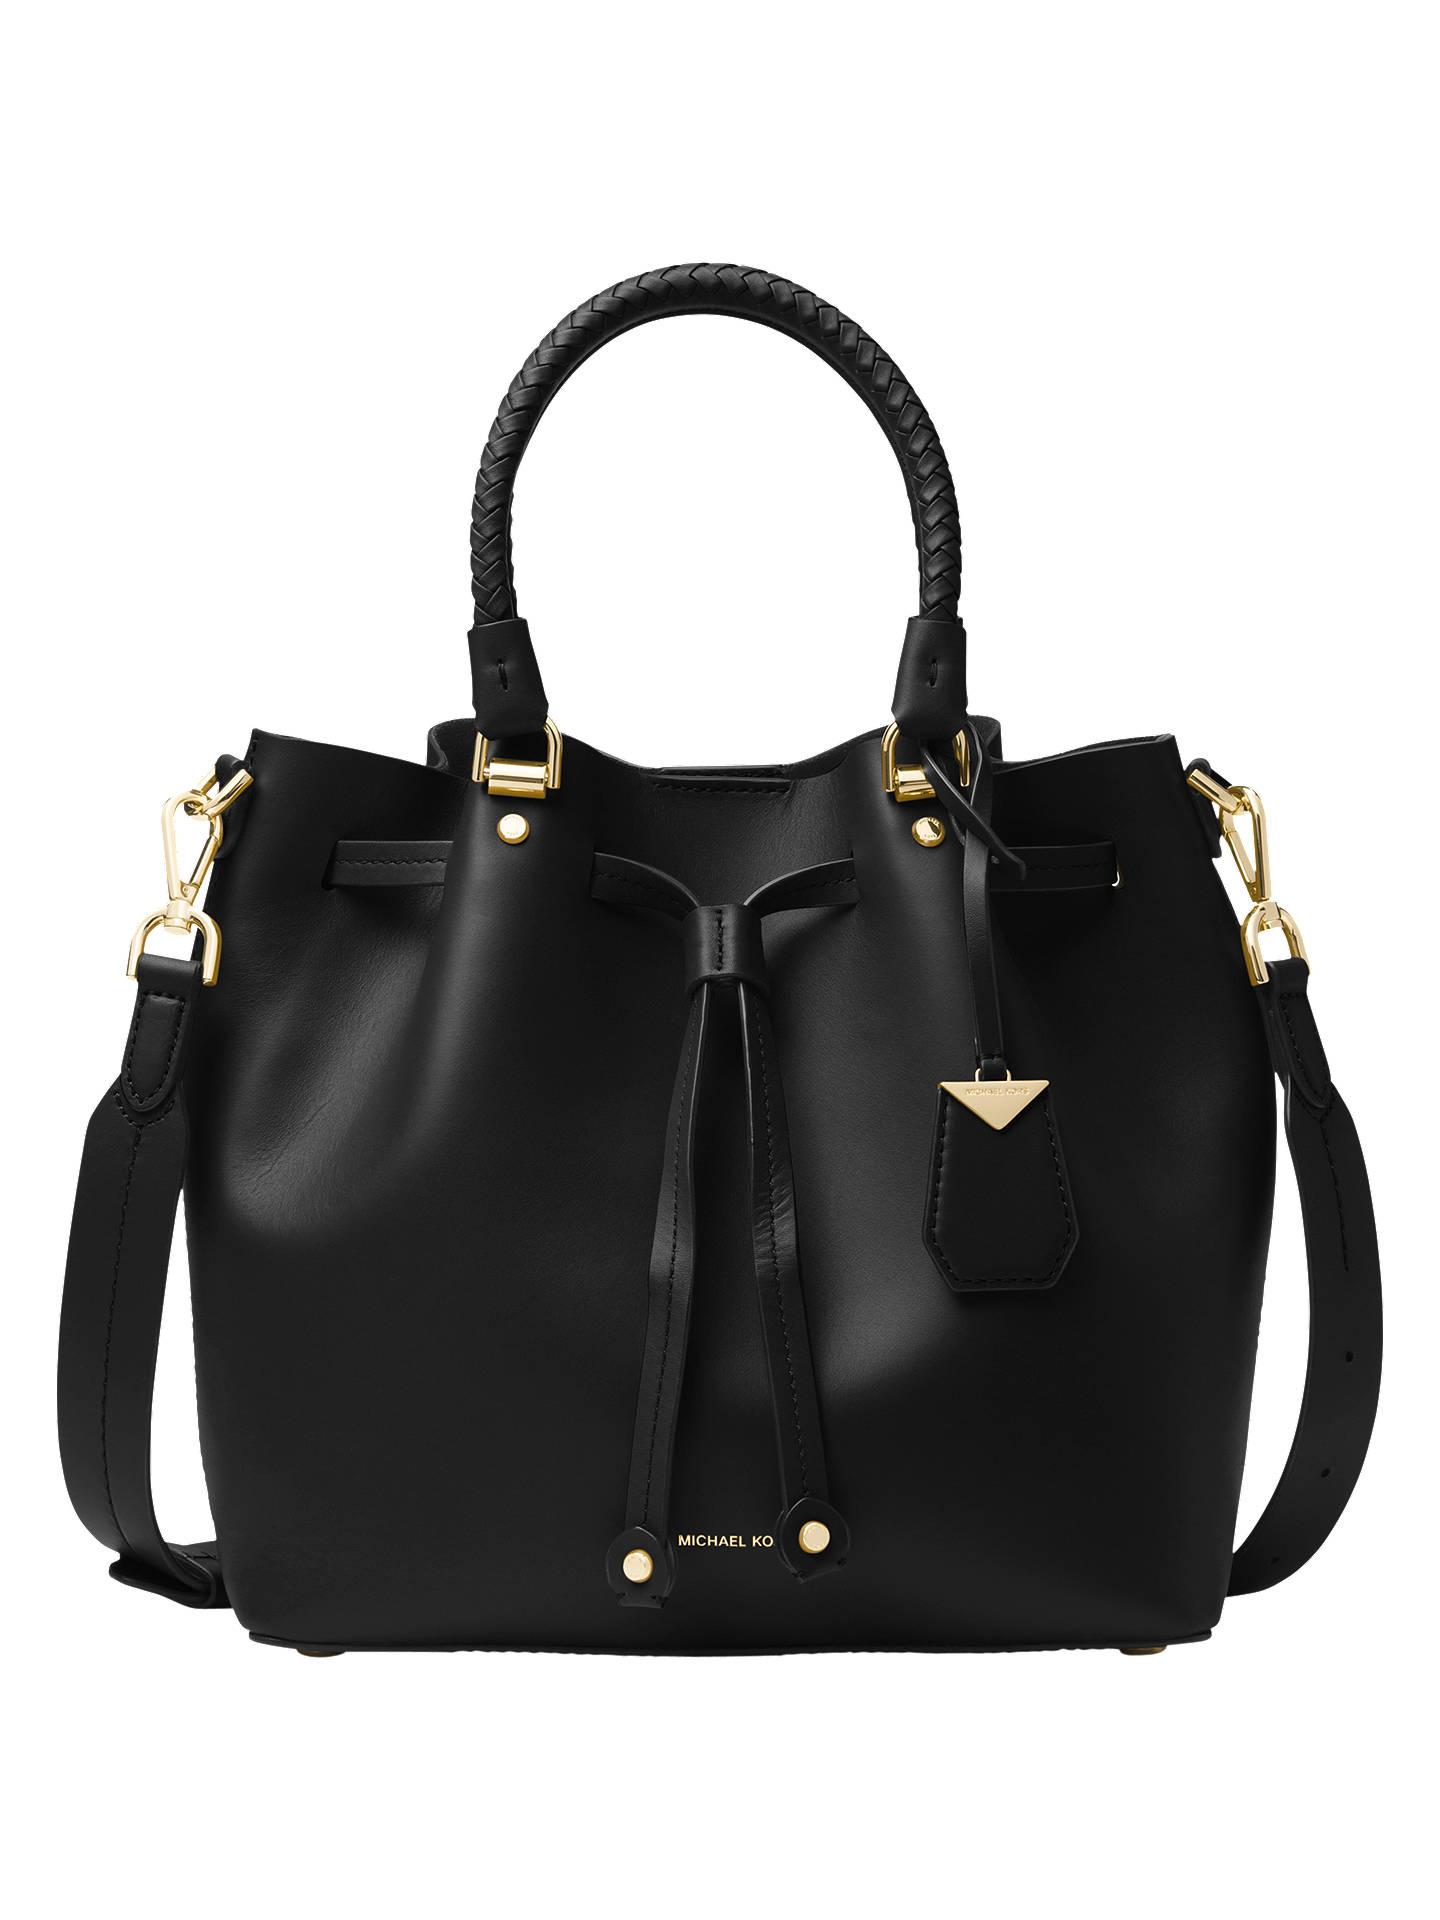 a8043807530c23 Buy MICHAEL Michael Kors Blakely Leather Bucket Bag, Black/Gold Online at  johnlewis.